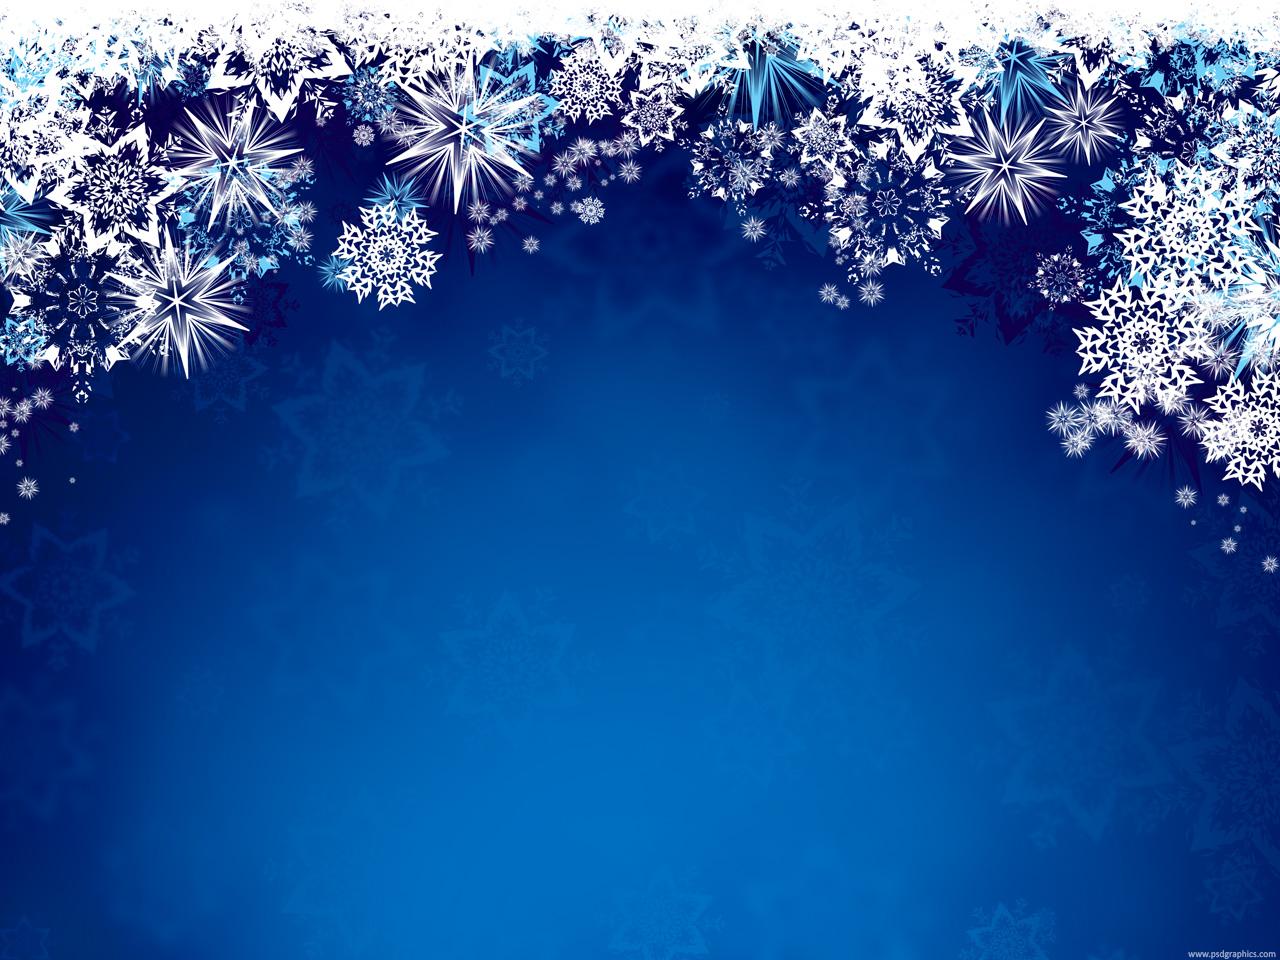 Winter Background | Winter backgrounds | Pinterest